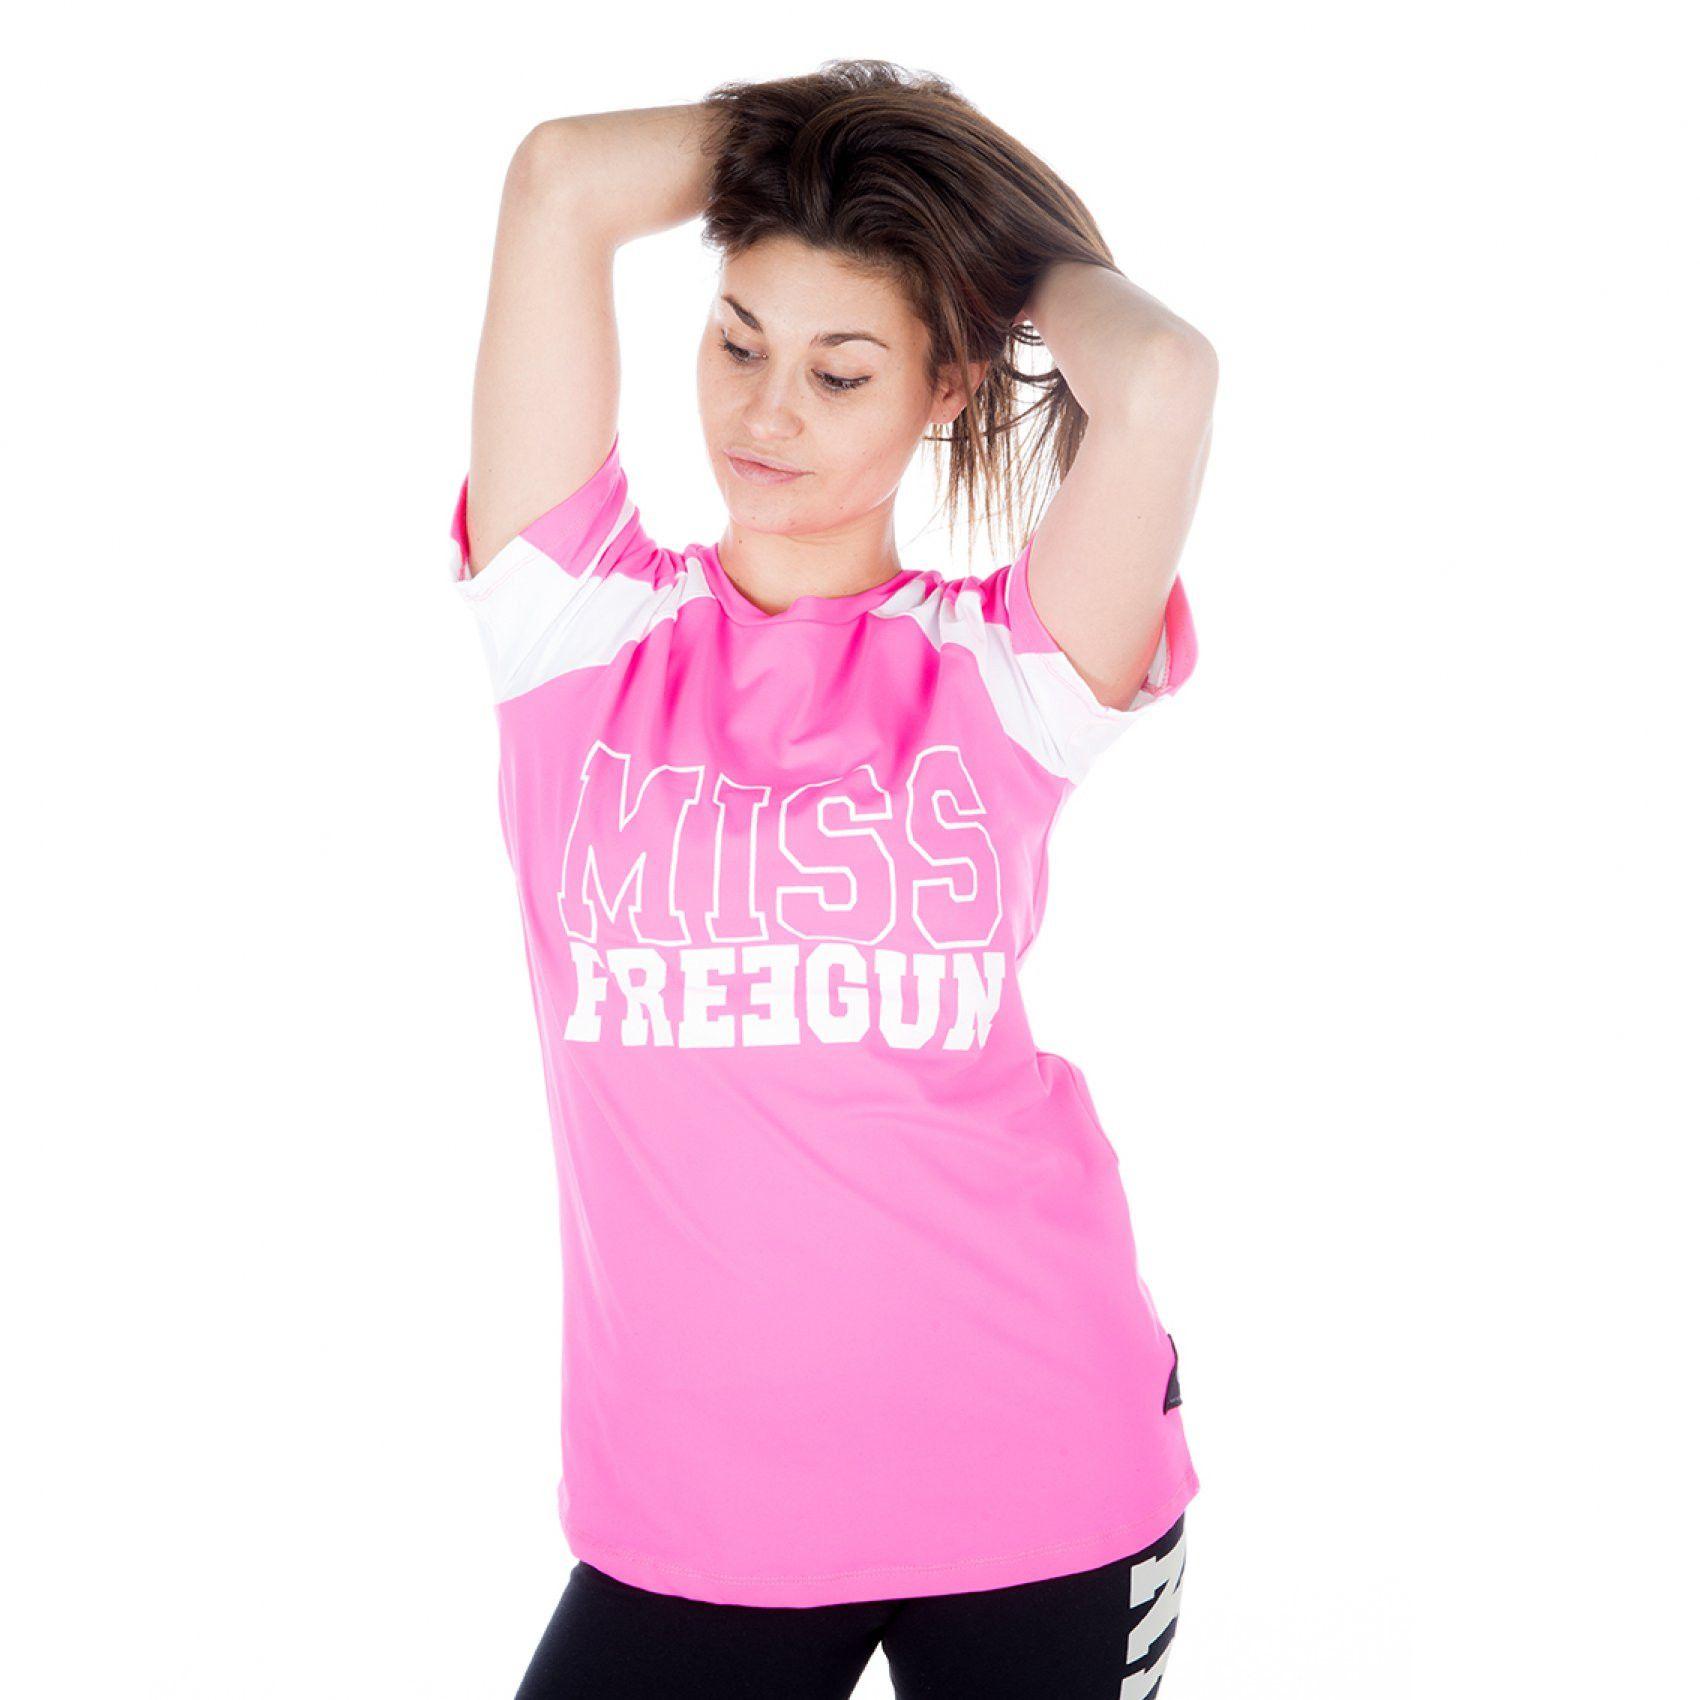 T-shirt freegun femme manches courtes